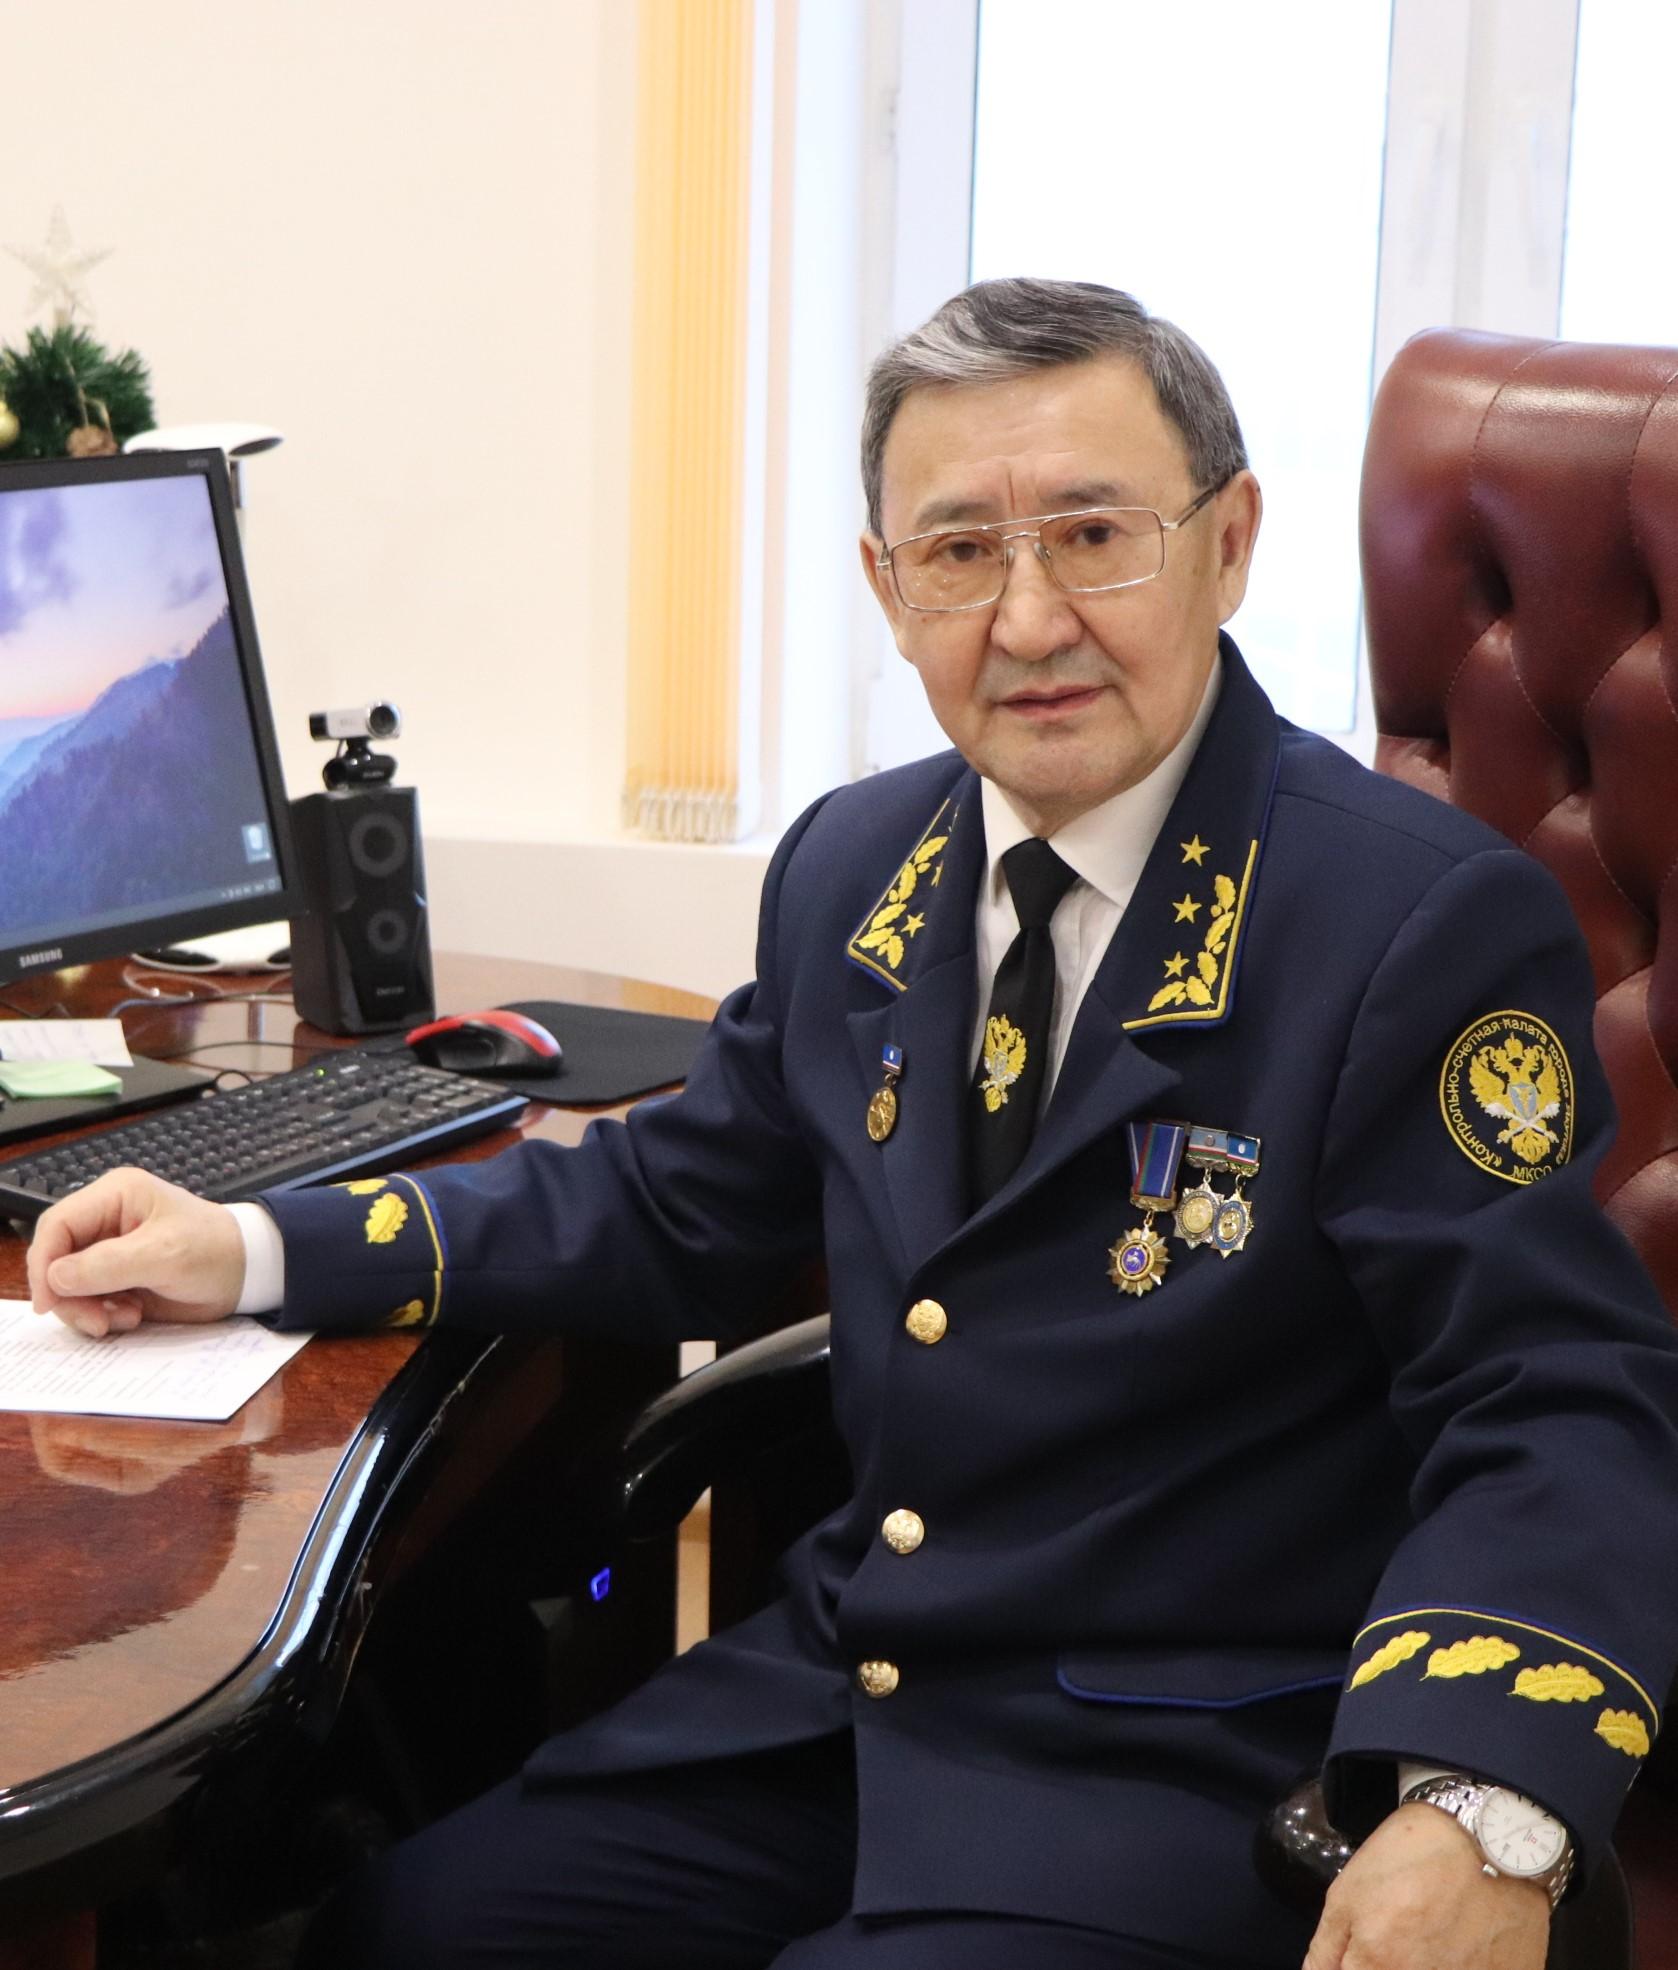 http://forumupload.ru/uploads/000b/27/15/43/841787.jpg